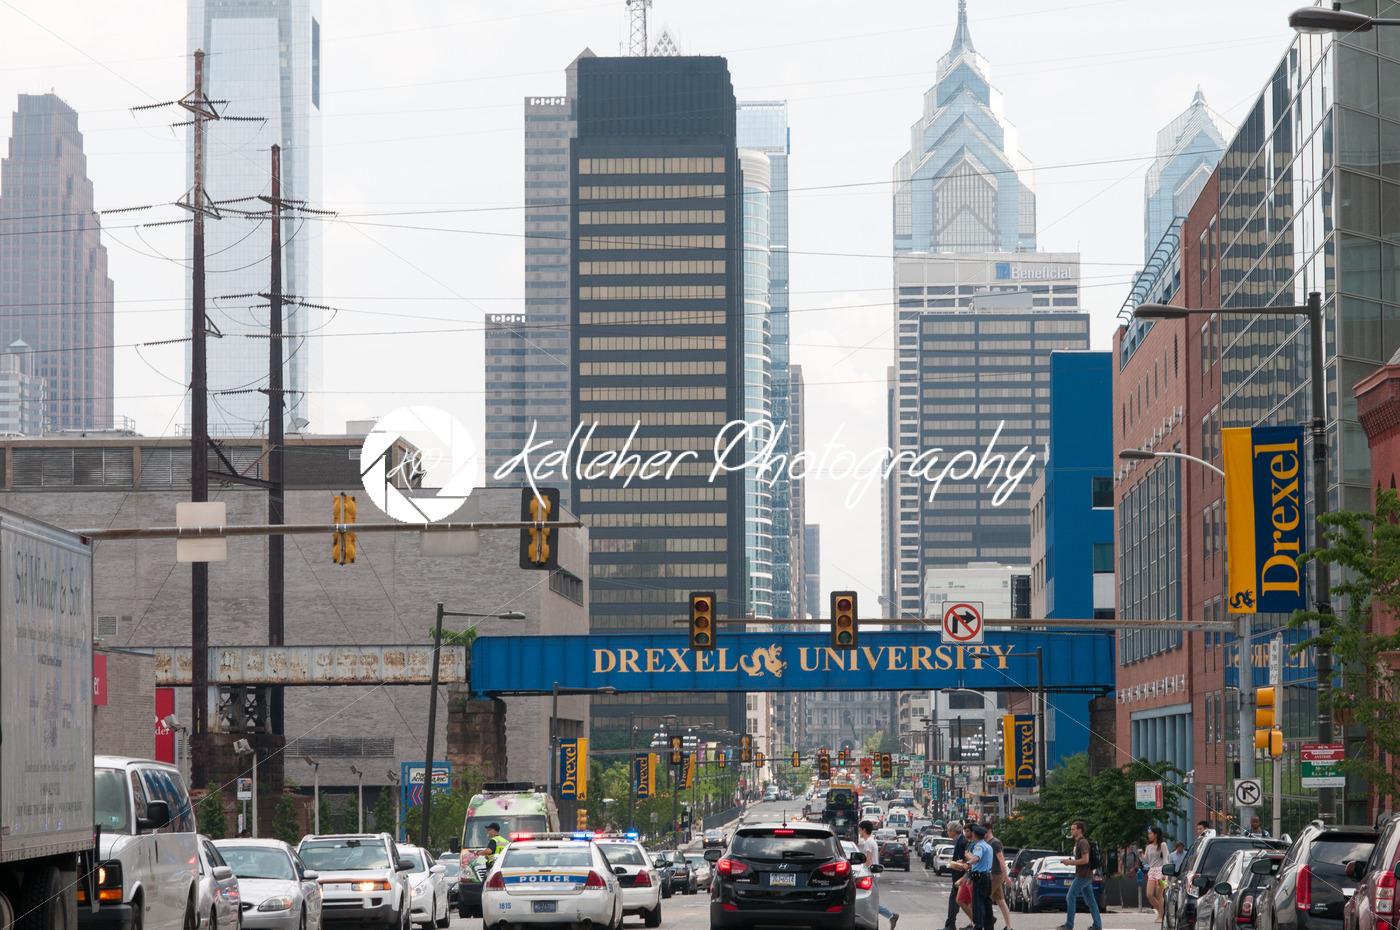 PHILADELPHIA, PA – JUNE 13: Drexel University Campus in the University City section of West Philadelphia on graduation day on June 13, 2014 - Kelleher Photography Store